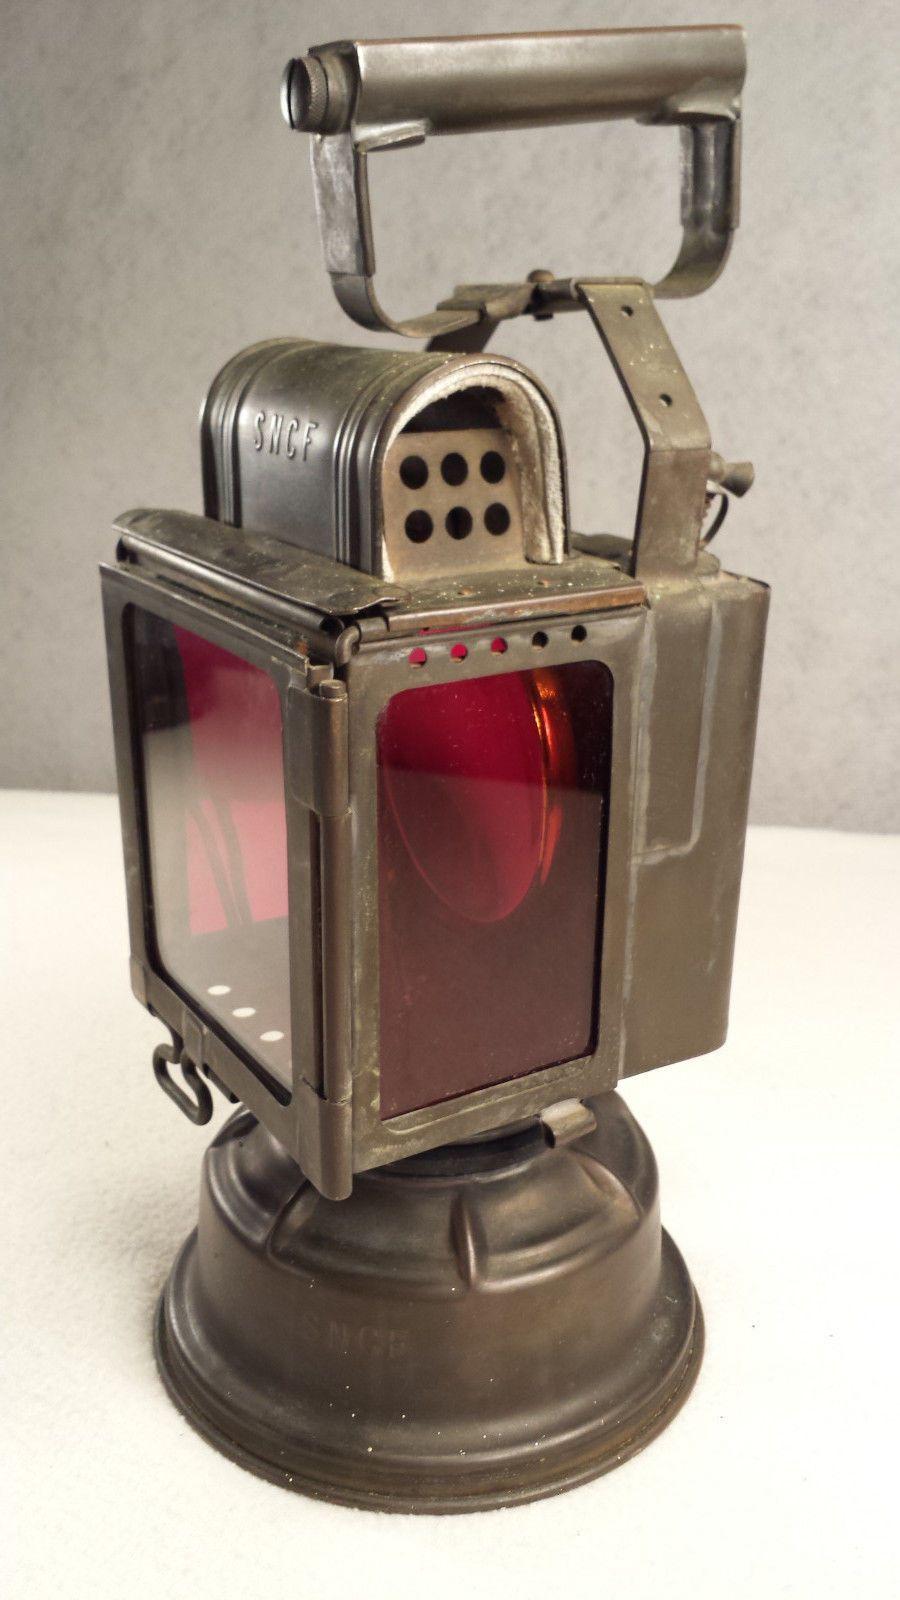 Vintage French SNCF Railroad Safety Lantern VGC Super Cool ...